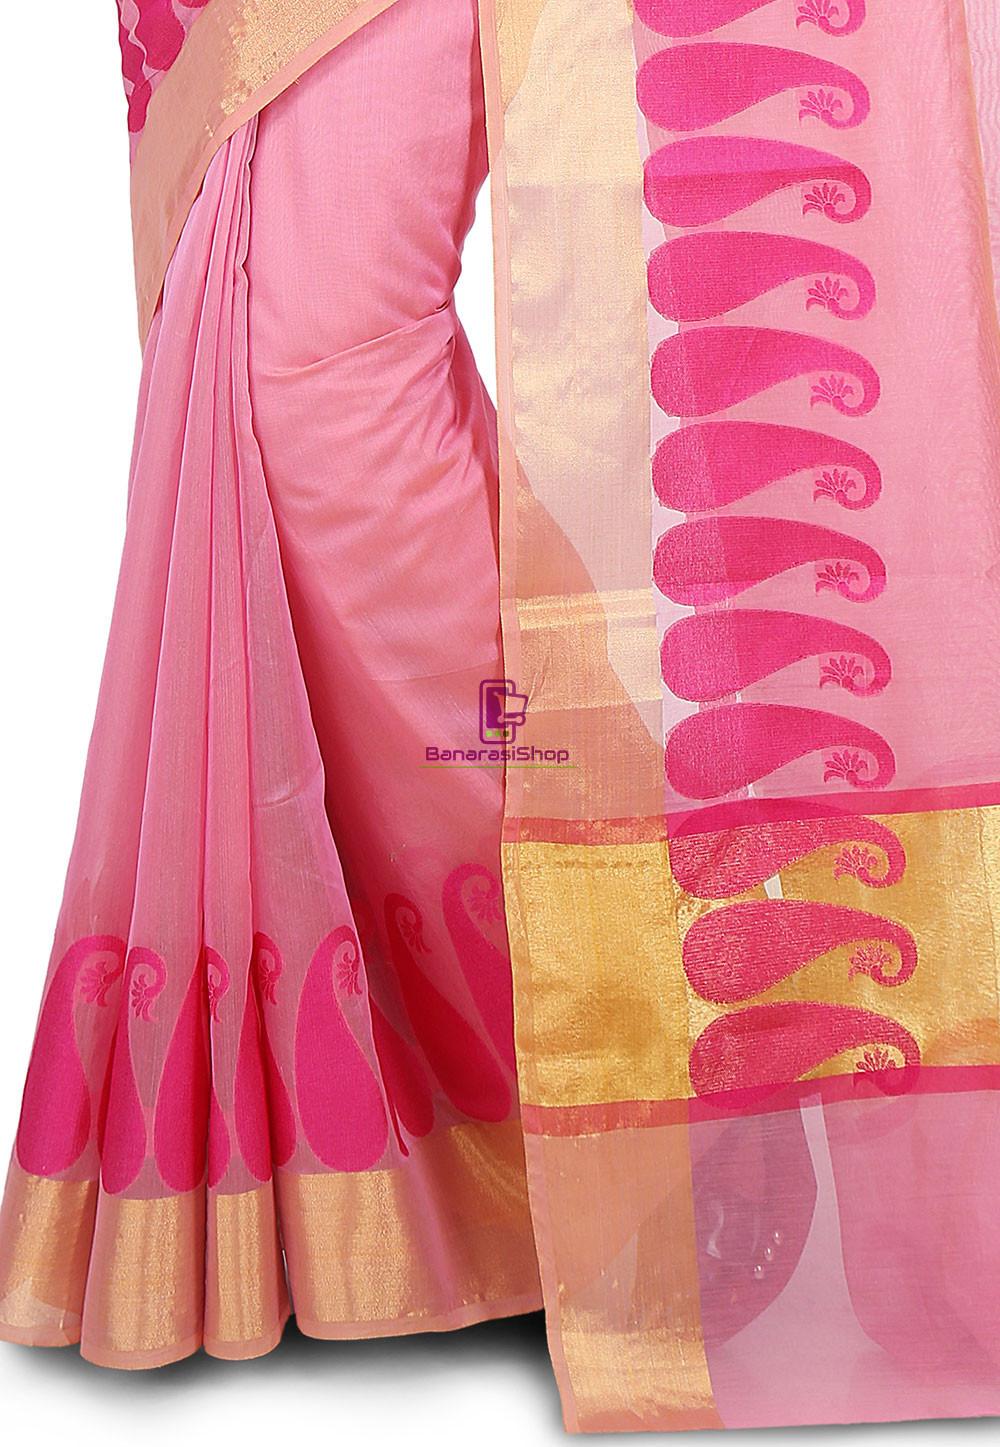 Woven Banarasi Chanderi Cotton Saree in Pink 3